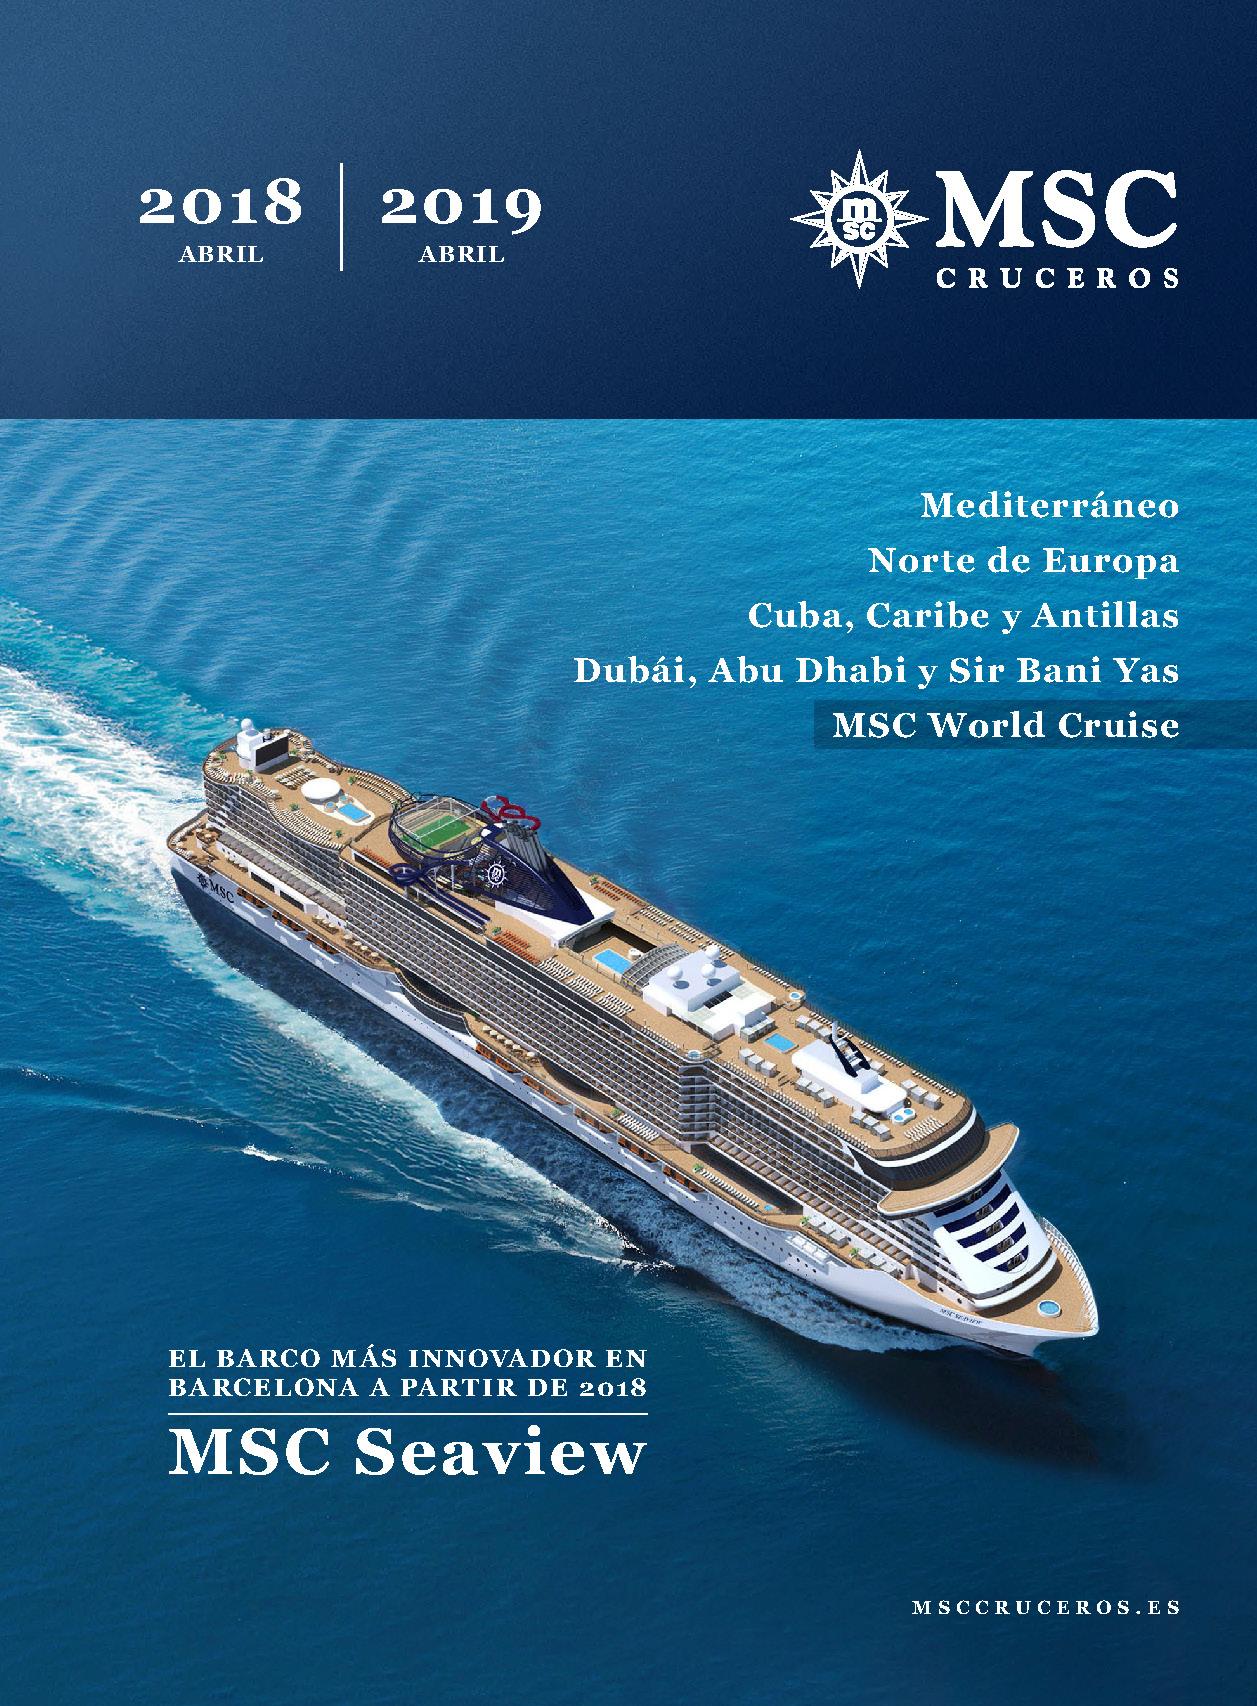 Cubierta Catalogo MSC 2018-2019